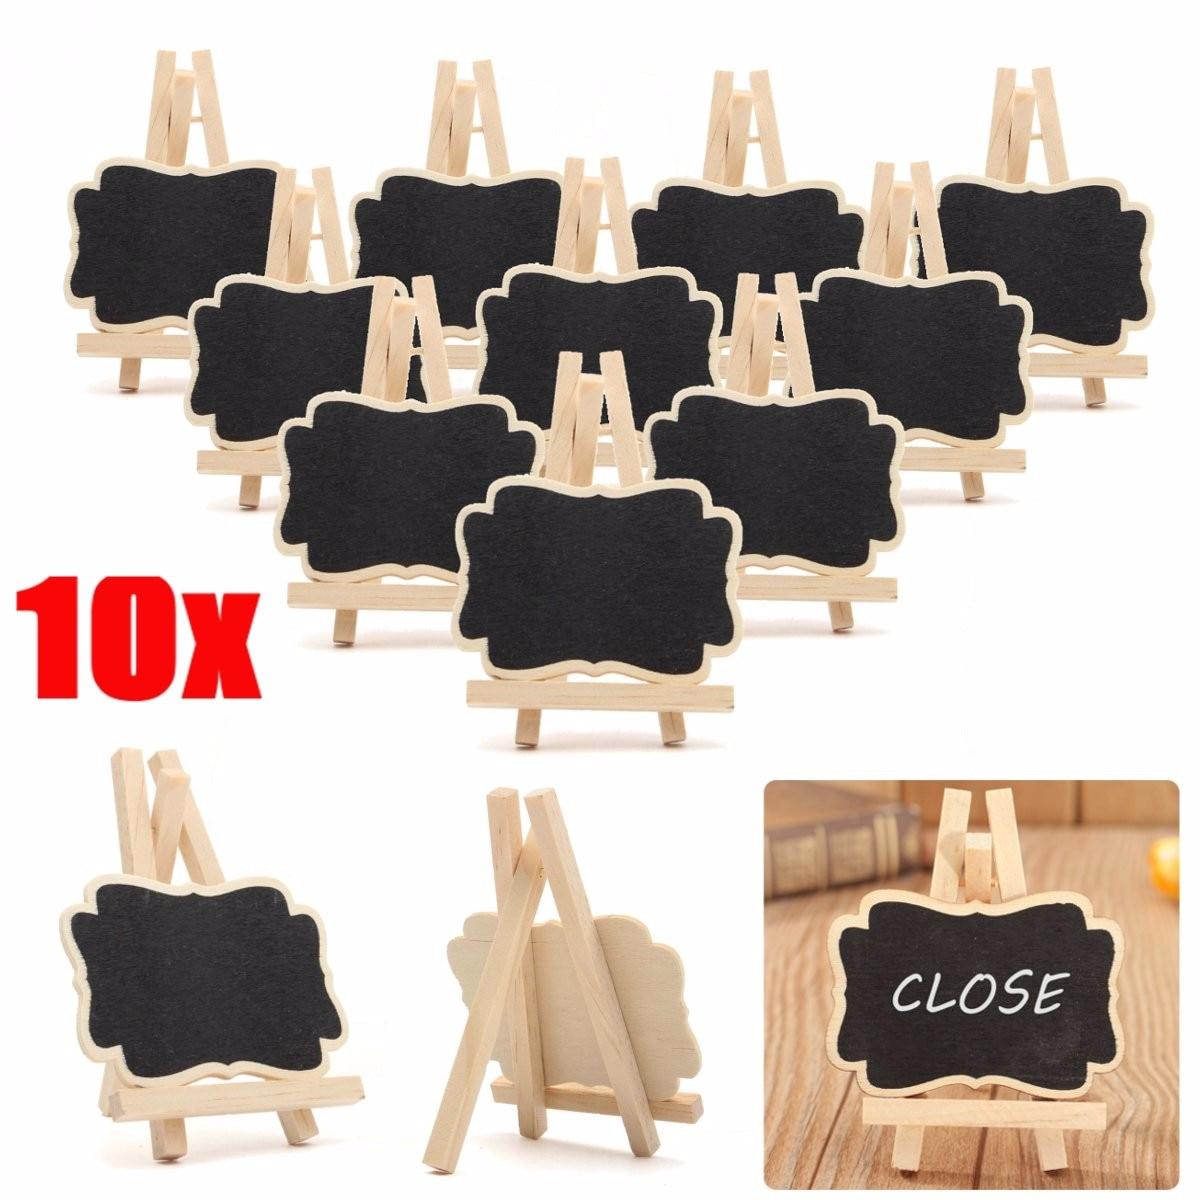 10pcs/lot Wooden Mini Blackboard Chalkboard Message Sign Crafts Decoration Wedding Party Decoration Marriage Supplies 9cm*6.7cm